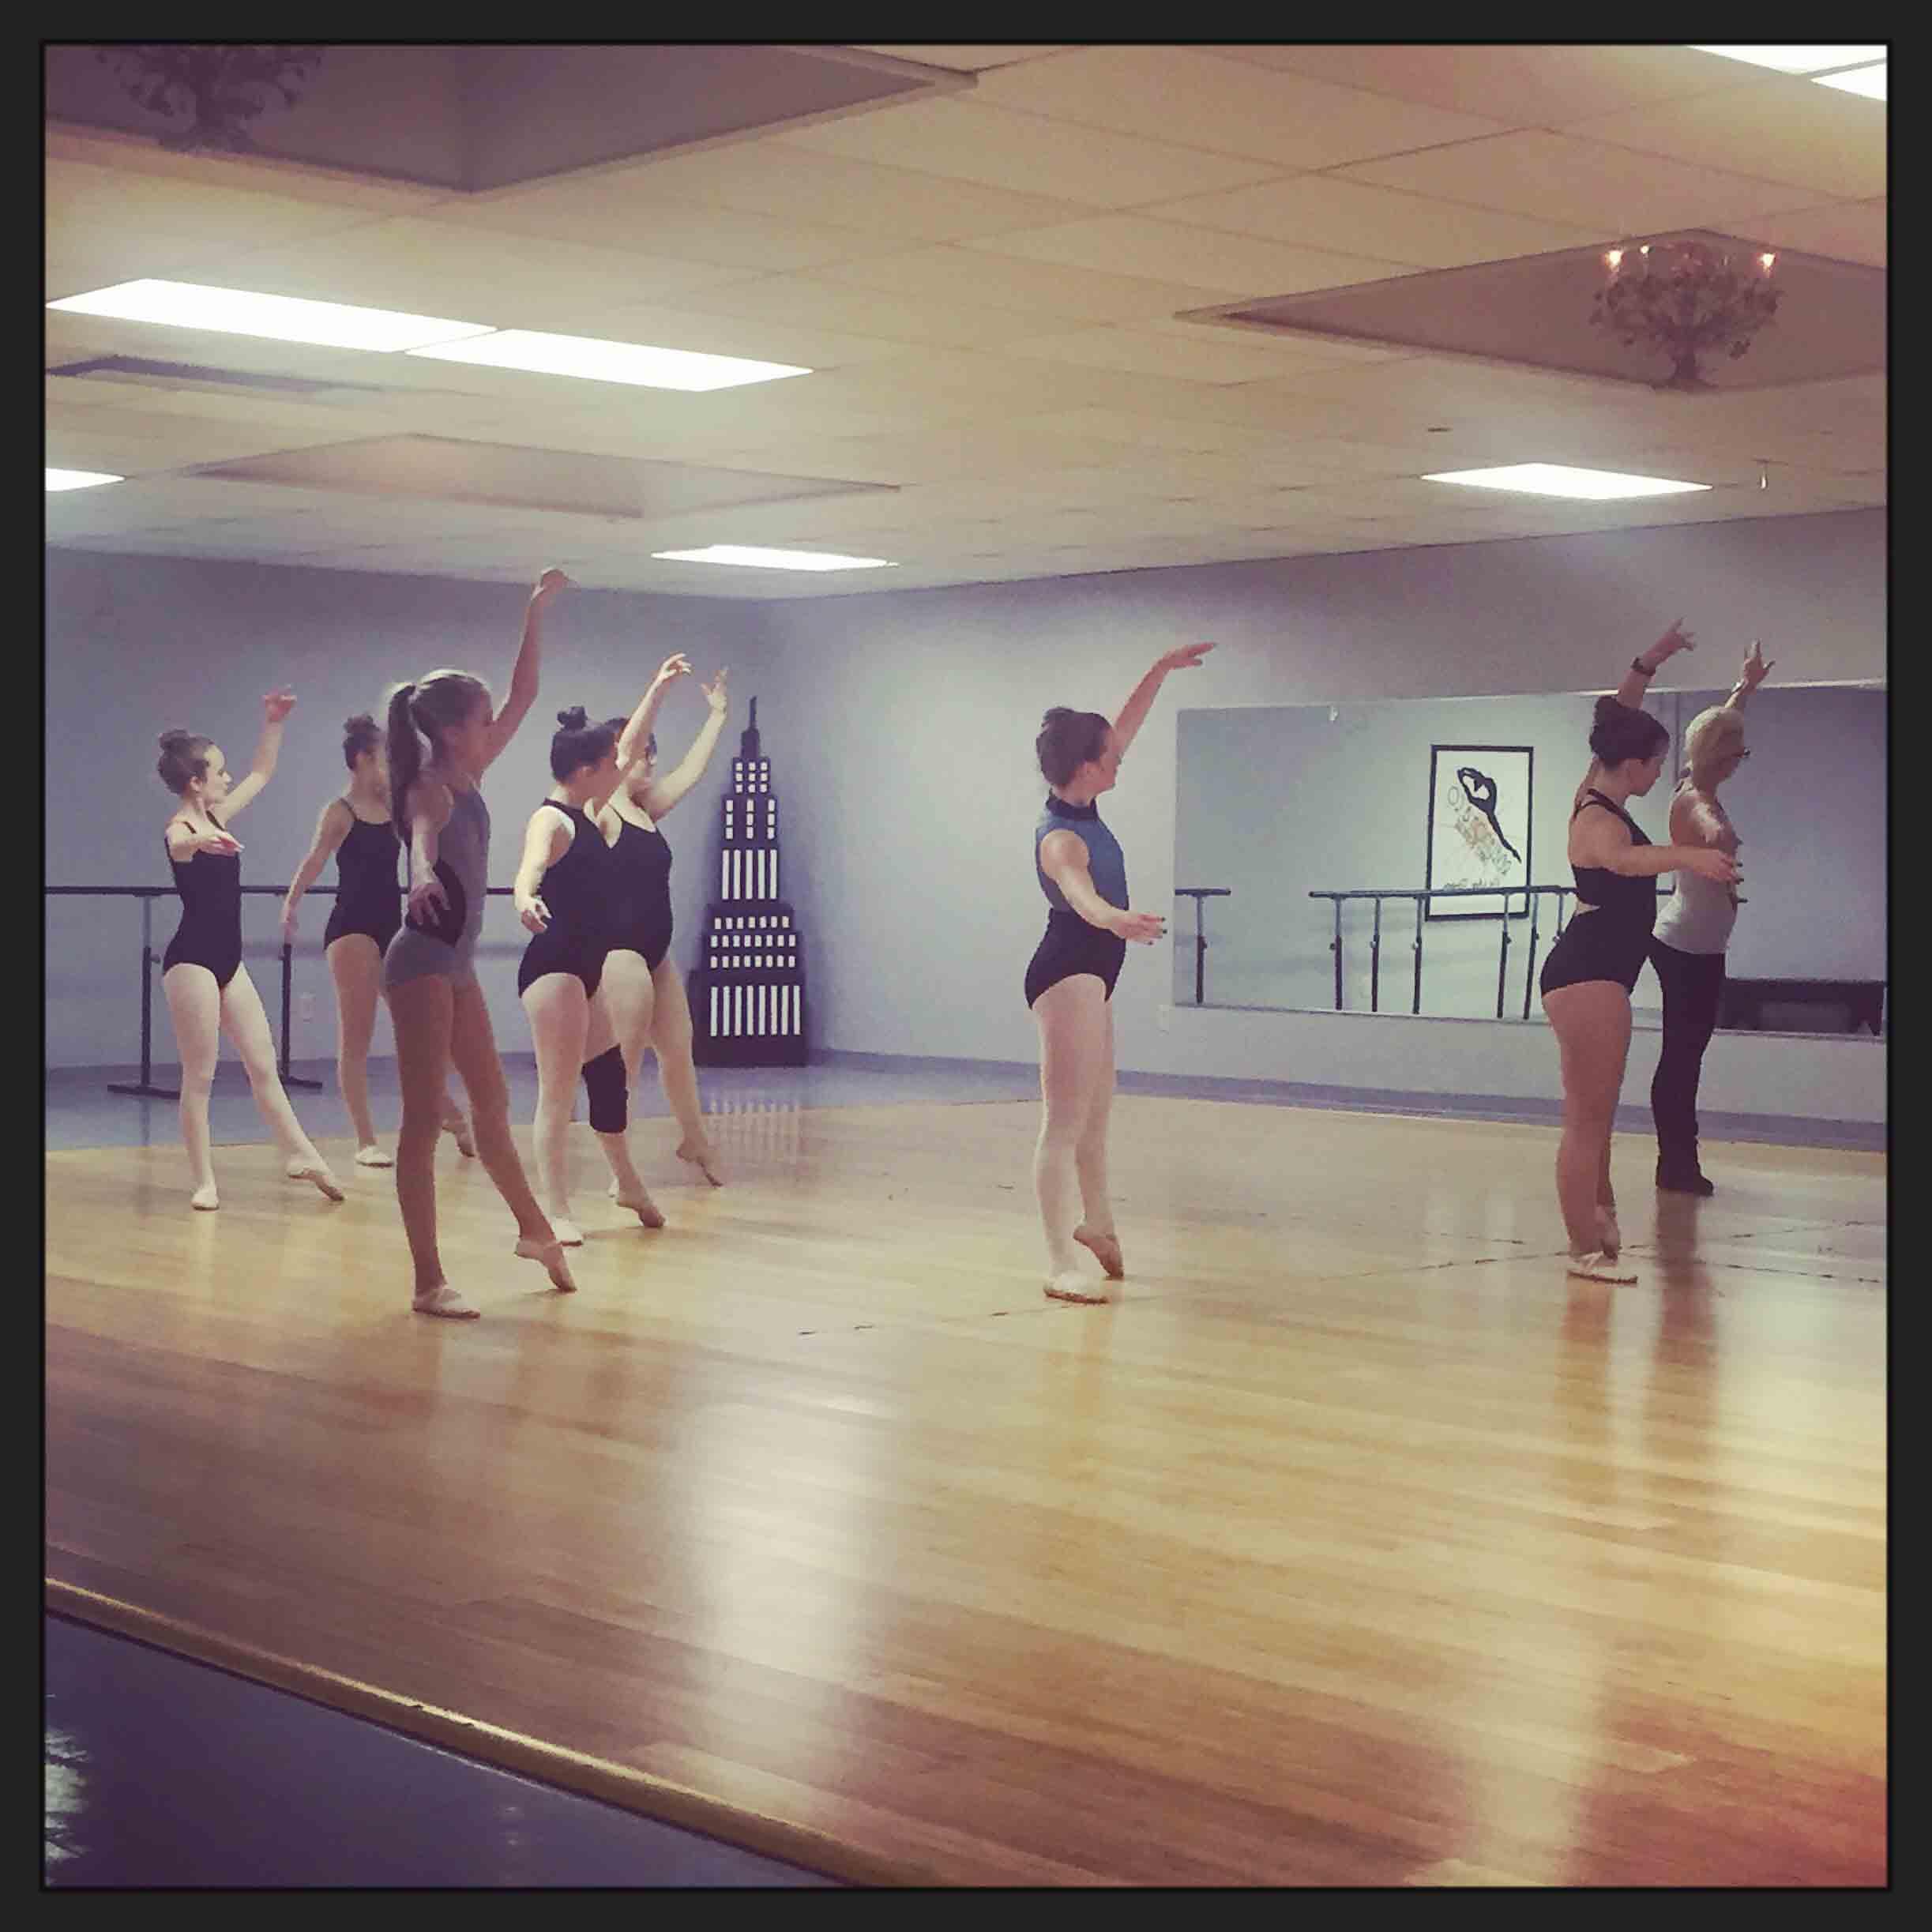 woodward oklahoma dance experience